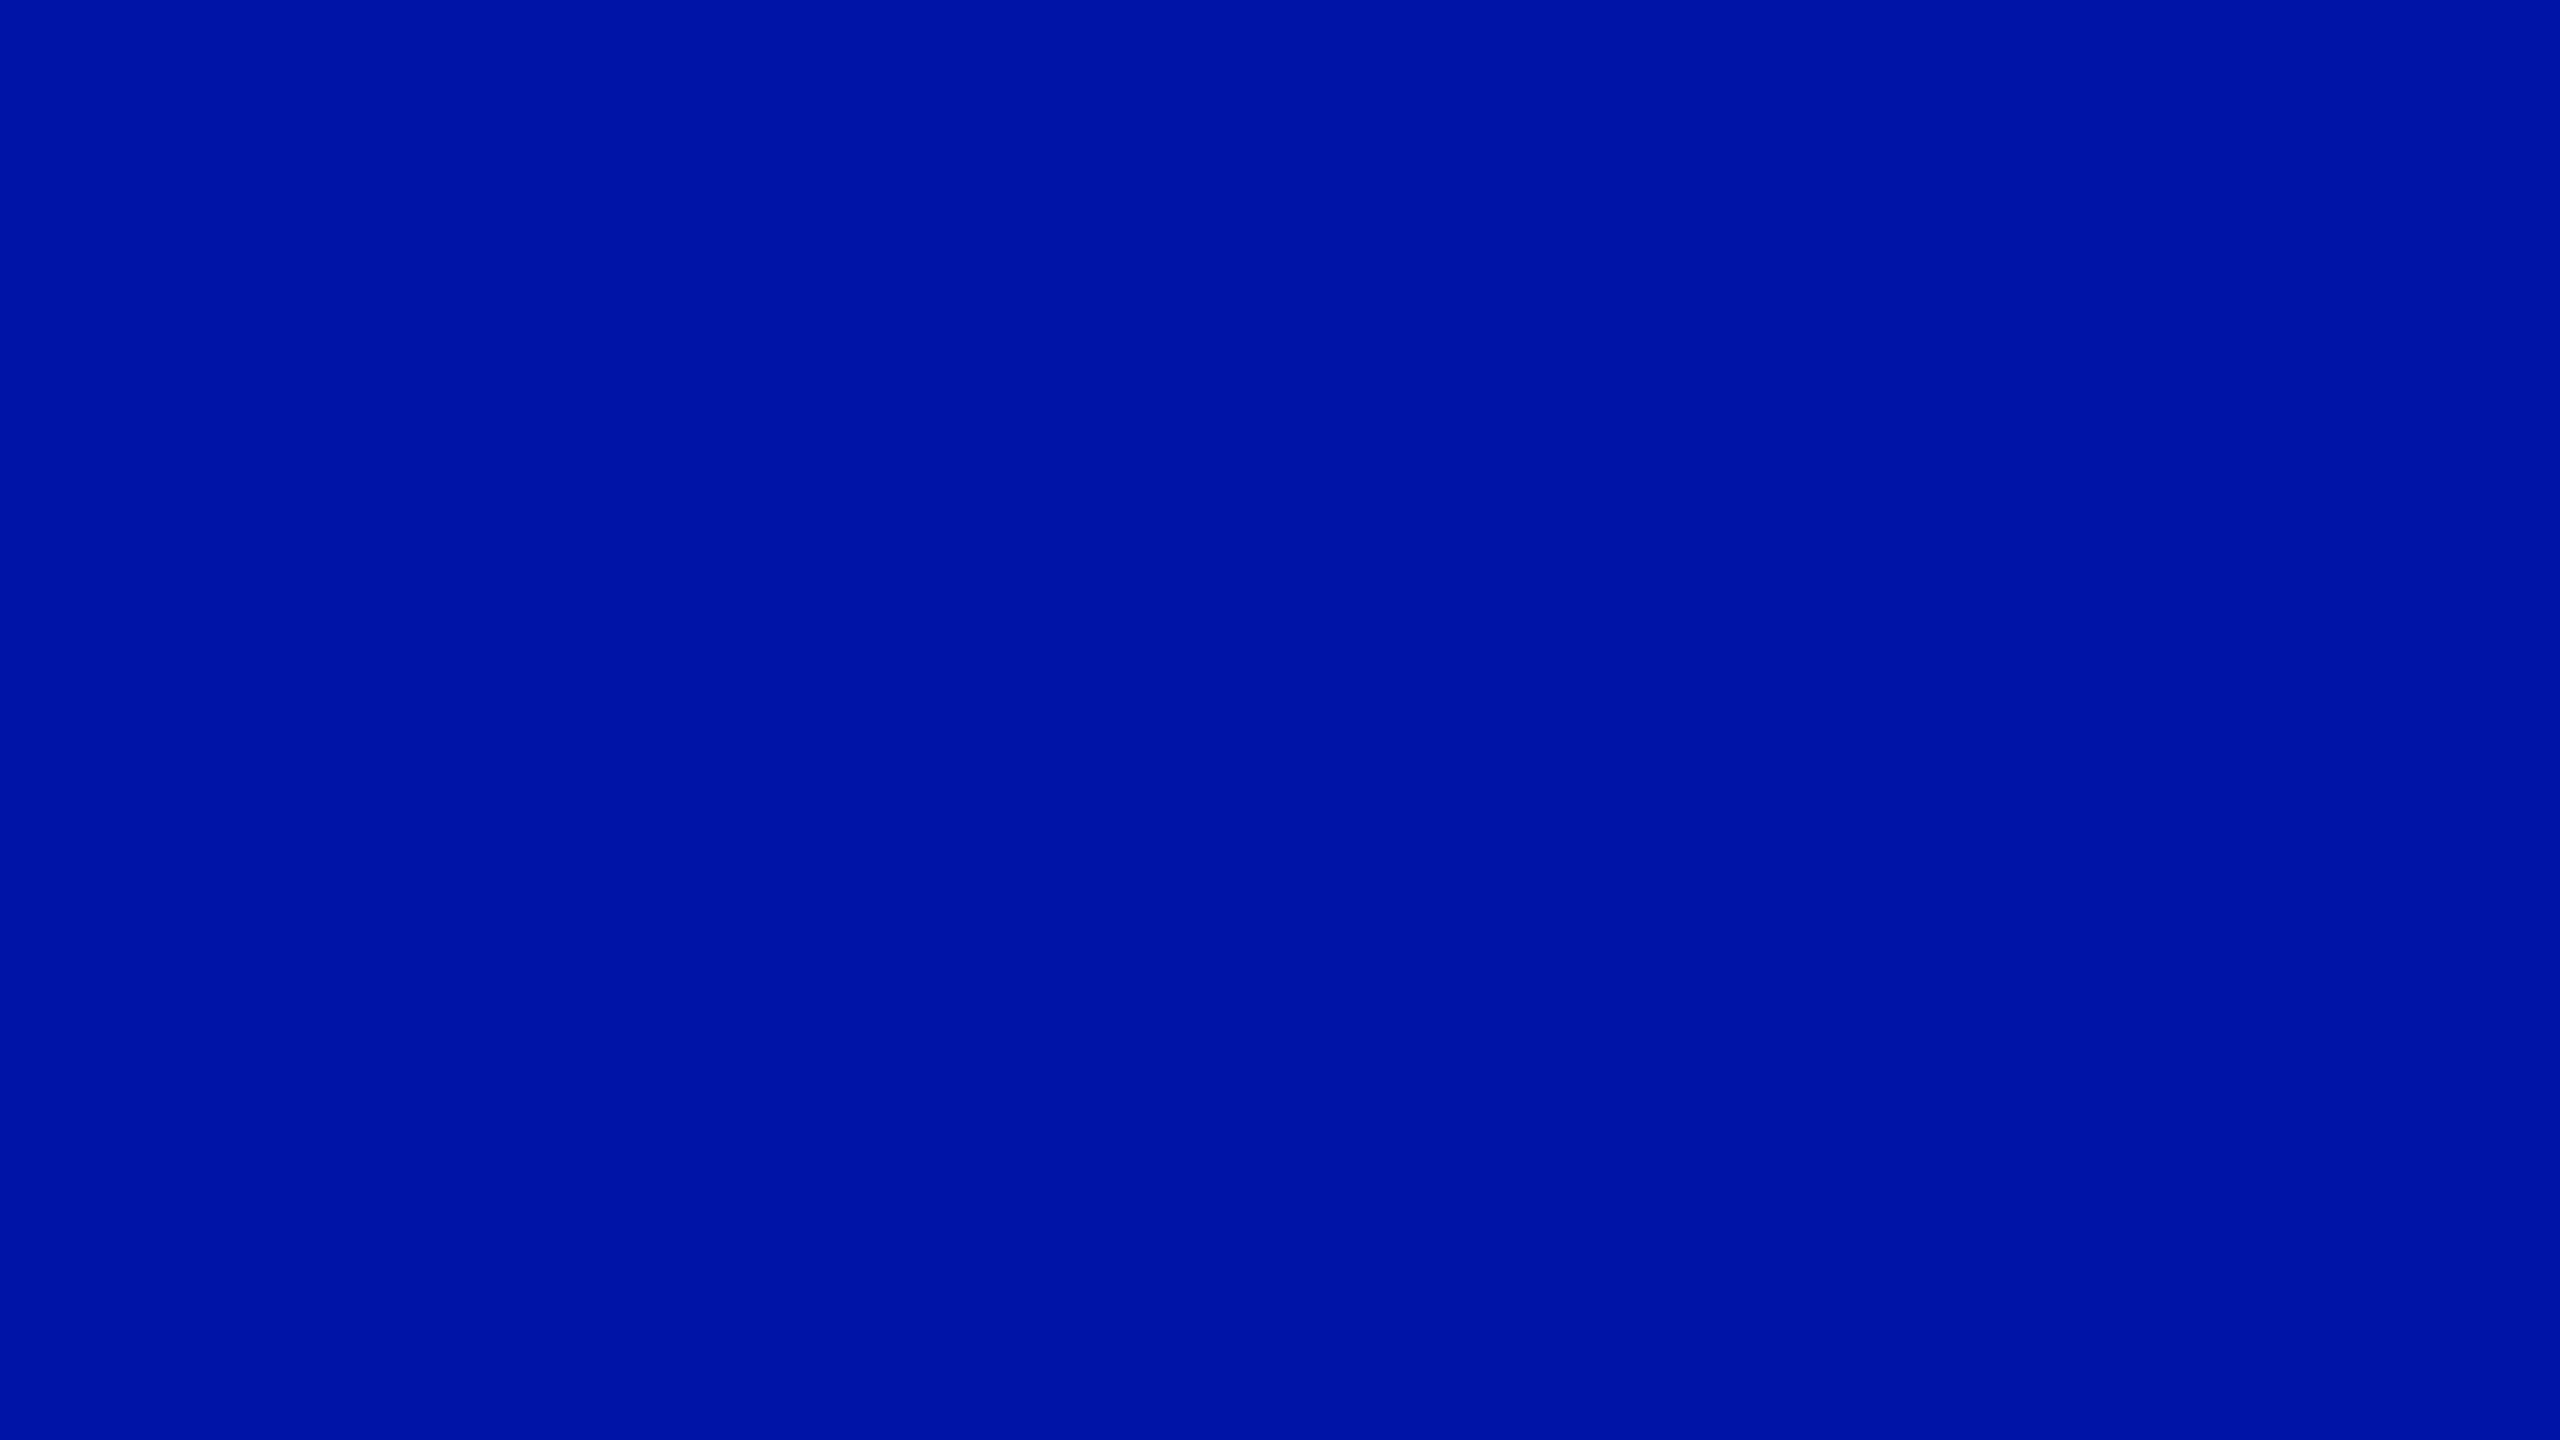 2560x1440 Zaffre Solid Color Background